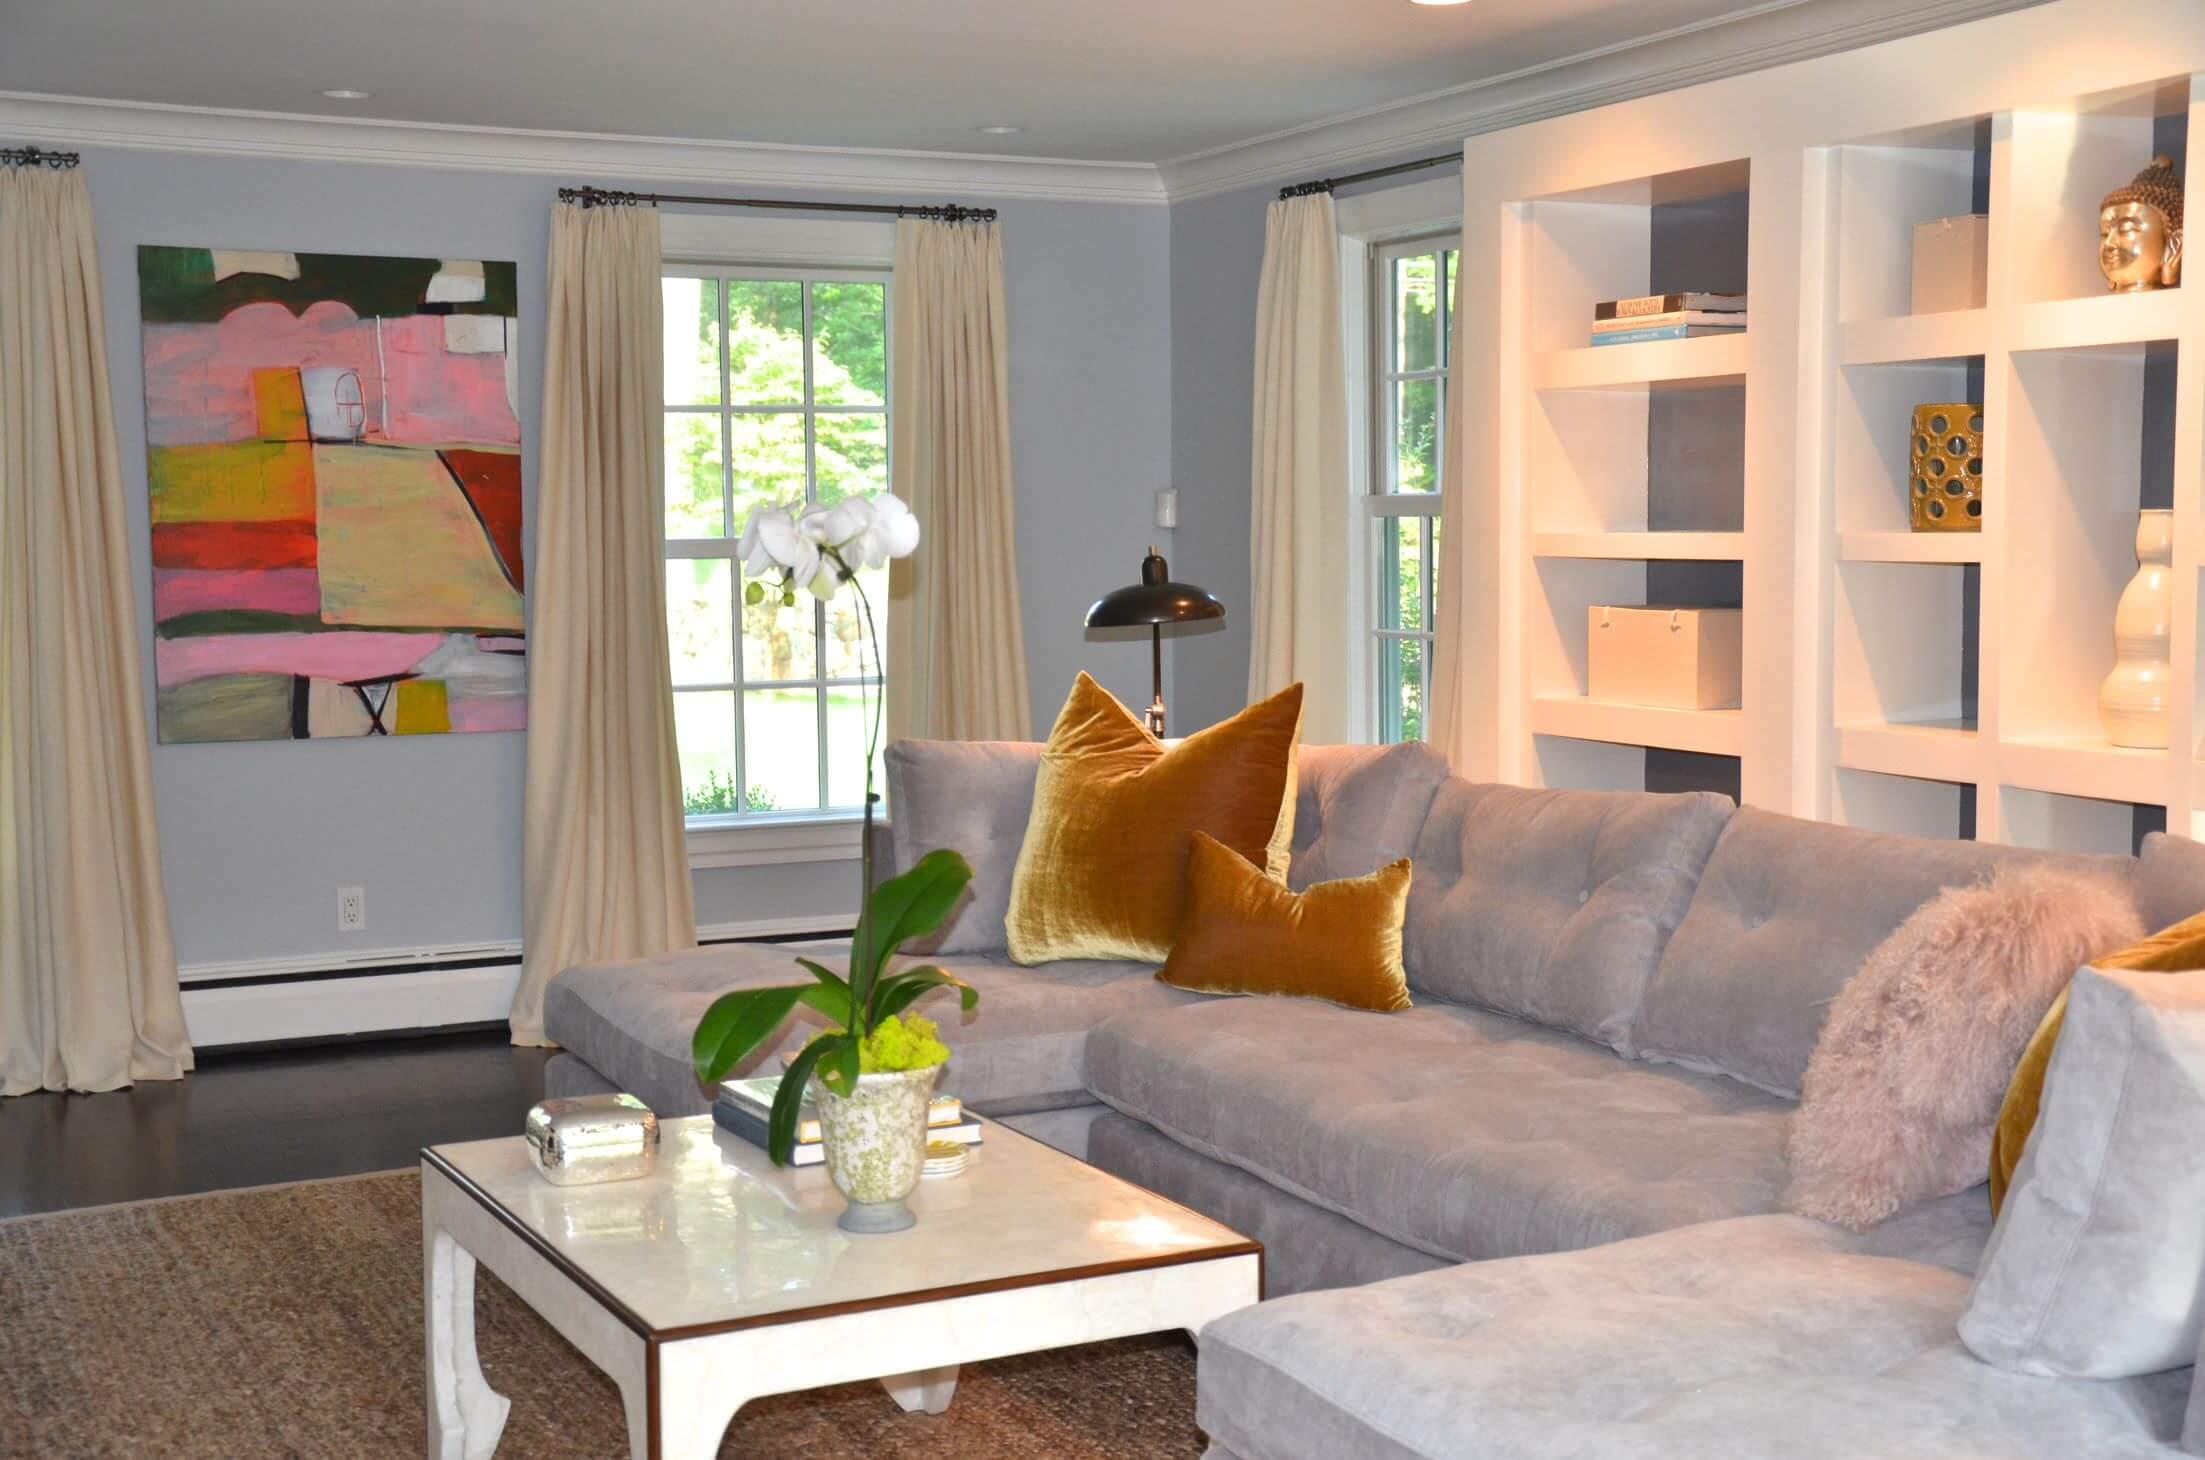 Fullsize Of Colorful Living Room Interior Design